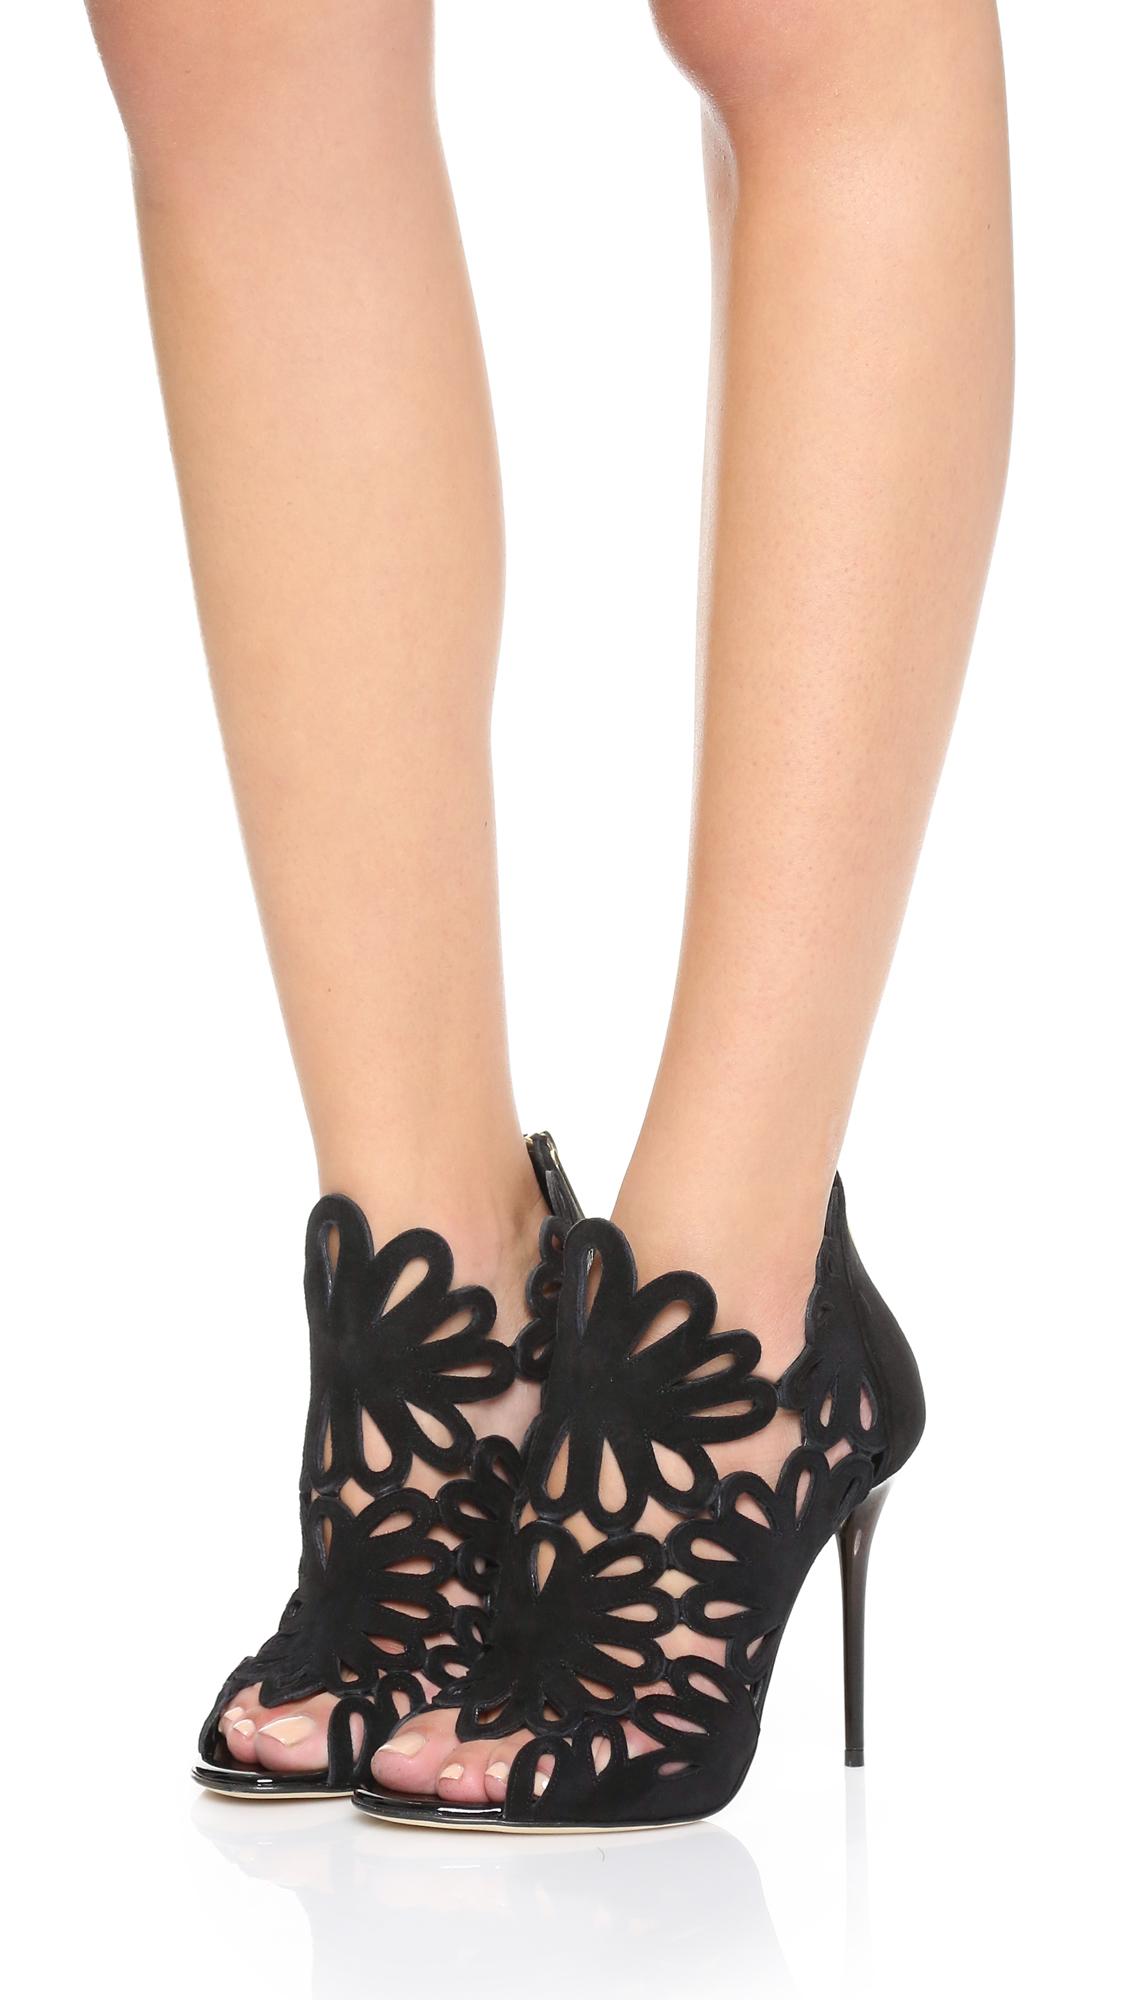 Oscar de la Renta Suede Cutout Sandals low shipping online IZRf4B